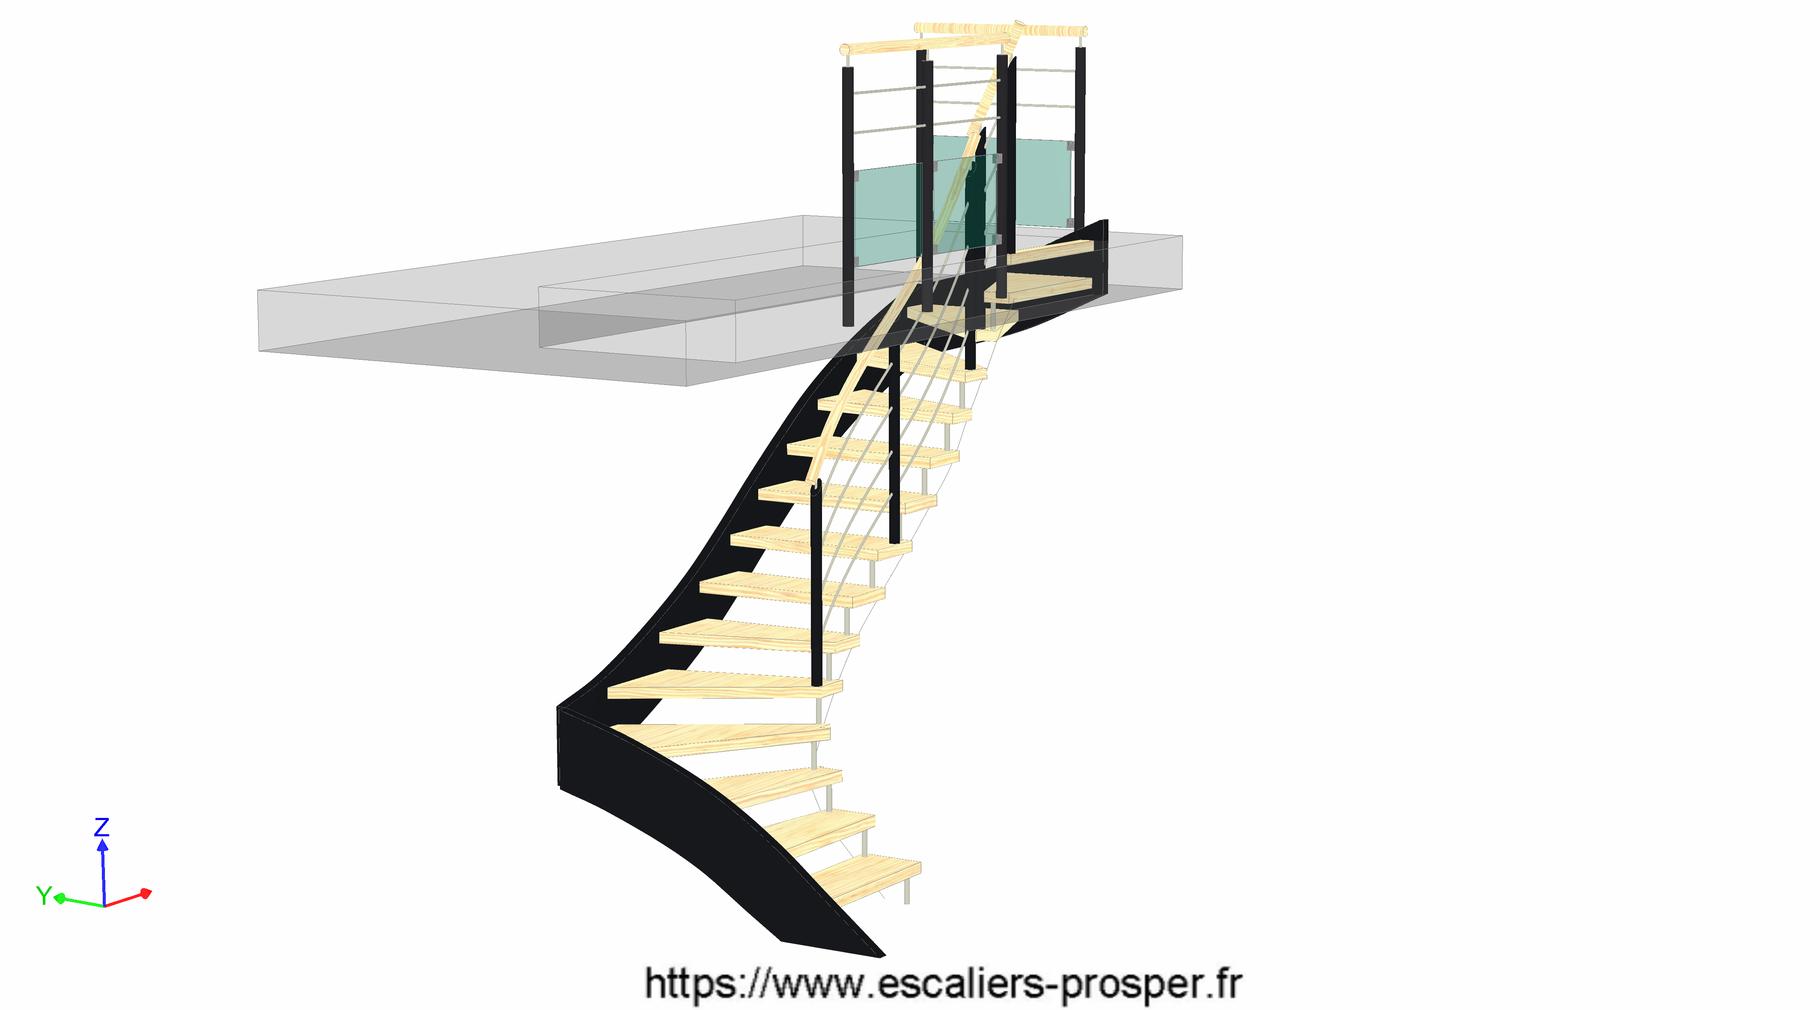 escalier en u suspendu douilles e15 171 sd rdc escaliers prosper sp cialiste de la. Black Bedroom Furniture Sets. Home Design Ideas